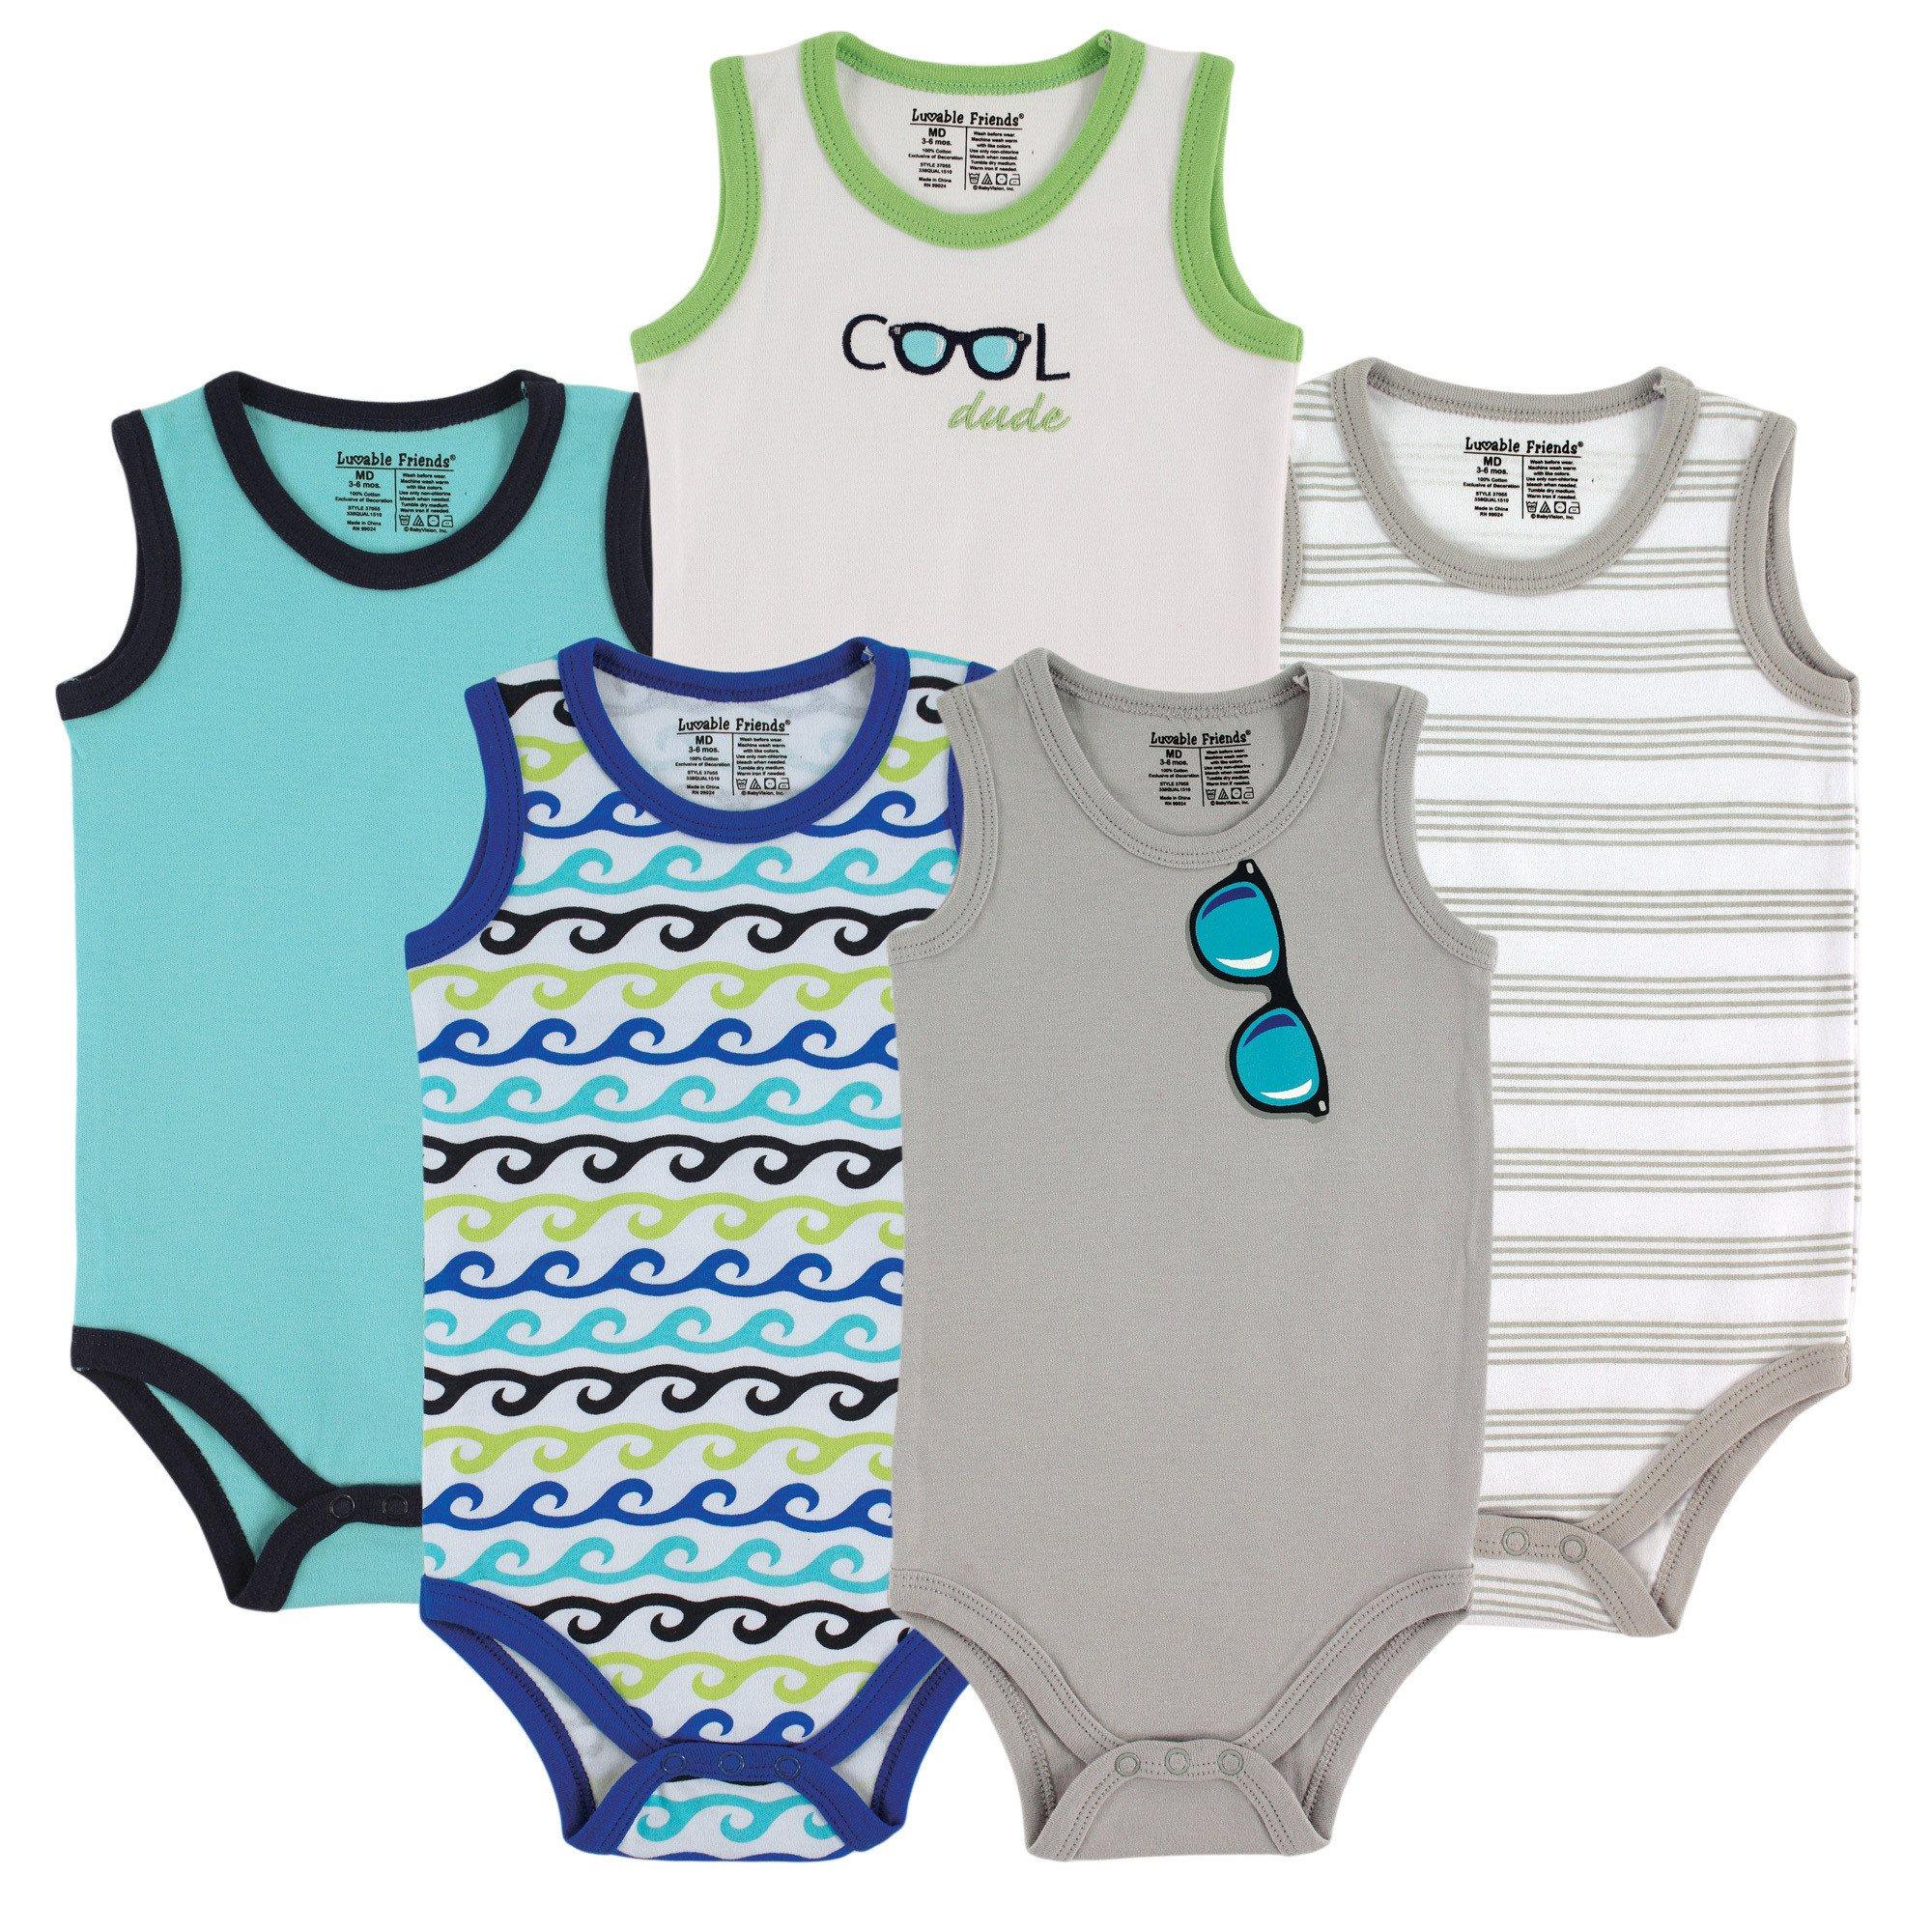 Luvable Friends 5-Pack Lightweight Sleeveless Bodysuits, Boy Sunglasses, 9-12 Months